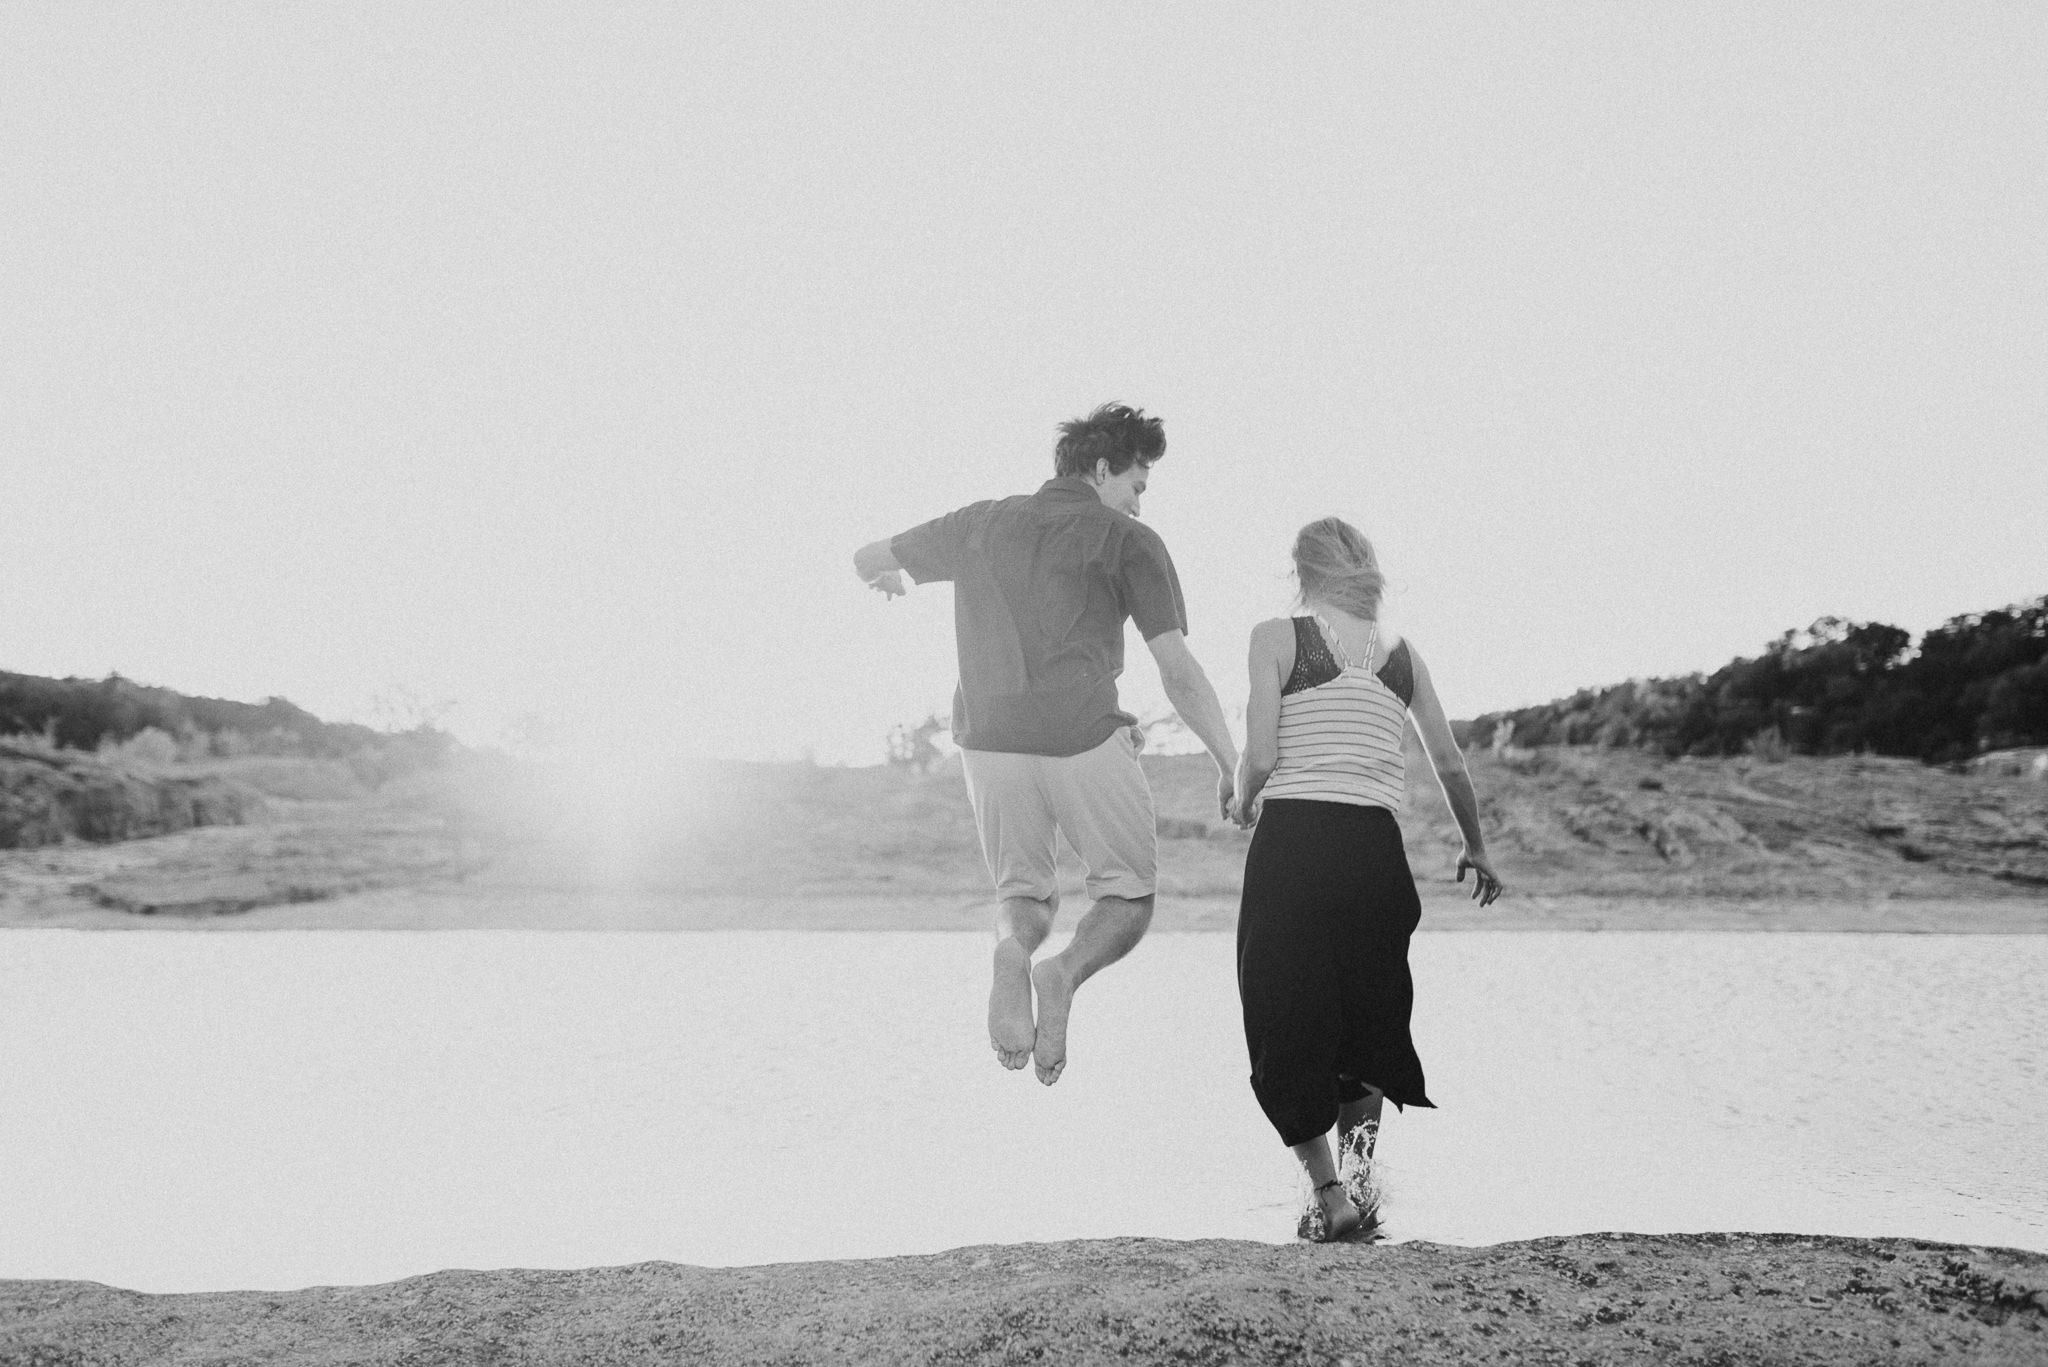 Michelle + Aron | Pederbales Falls Texas Engagement| Kristen Giles Photography - 089.jpg